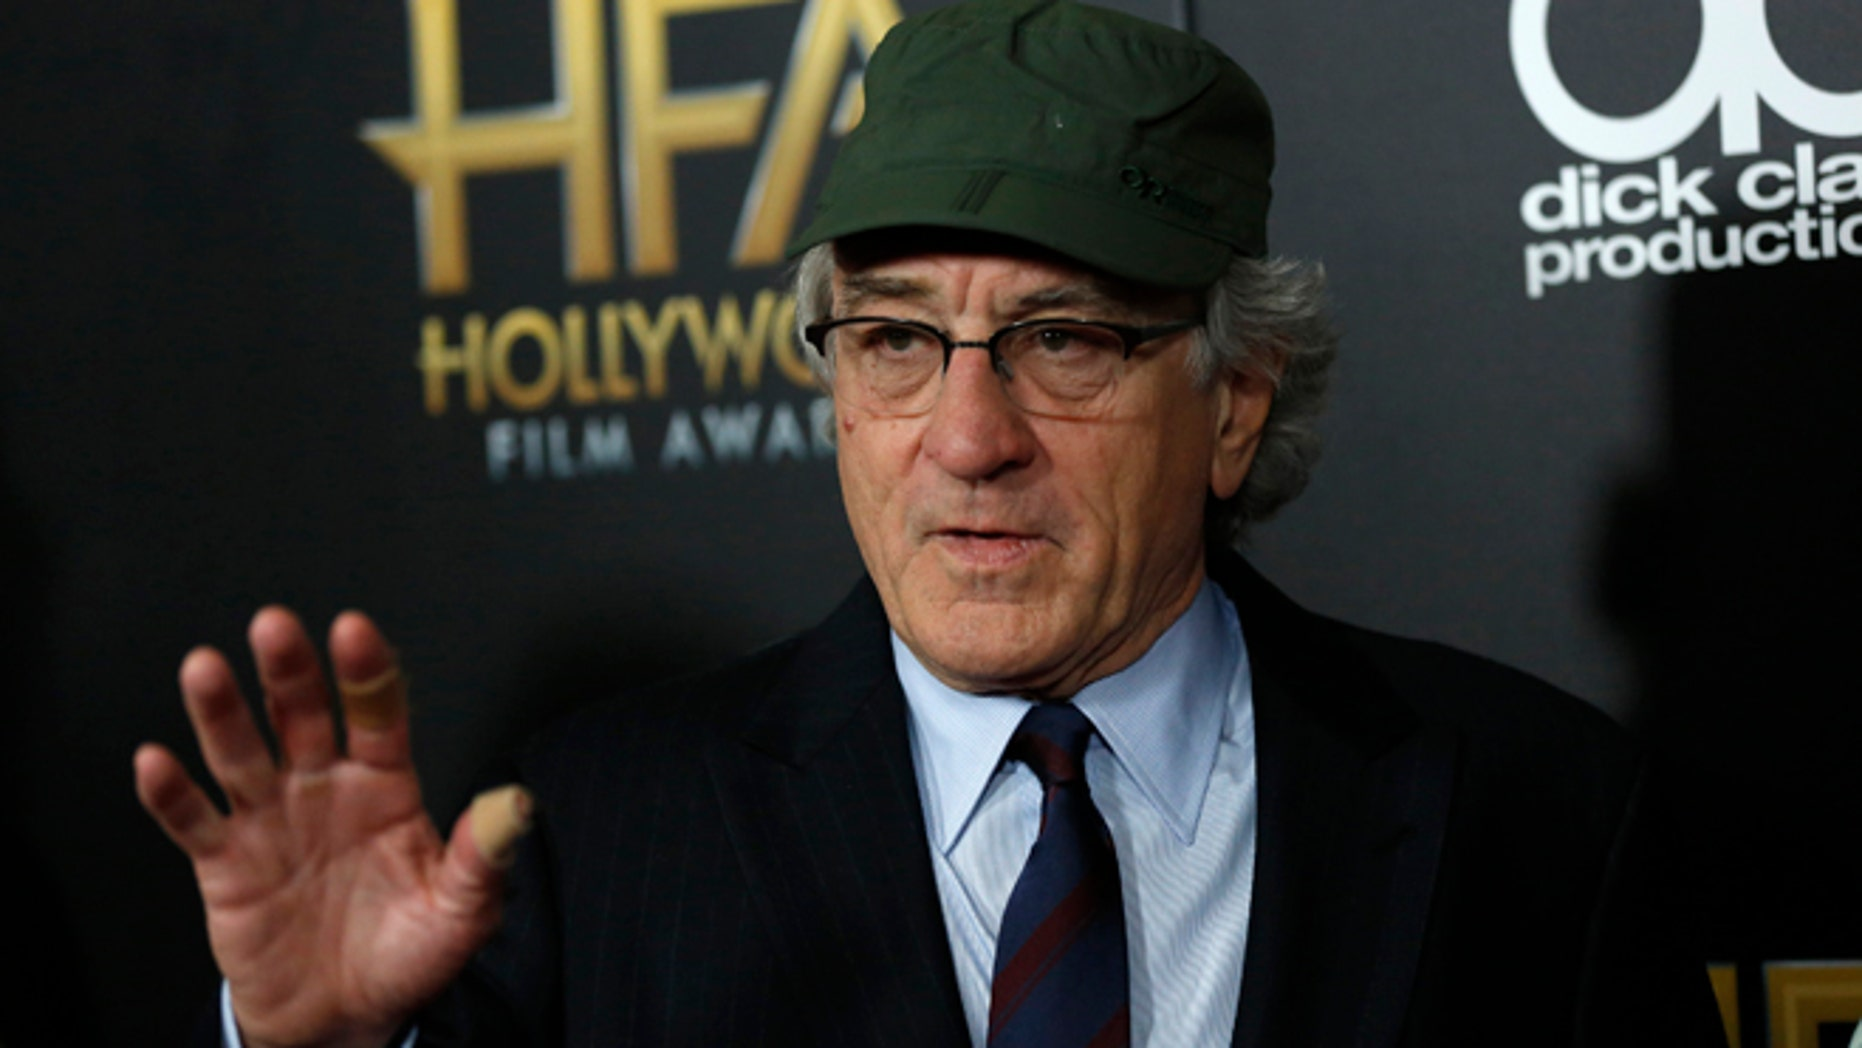 November 1, 2015. Actor Robert De Niro arrives at the Hollywood Film Awards in Beverly Hills, California.